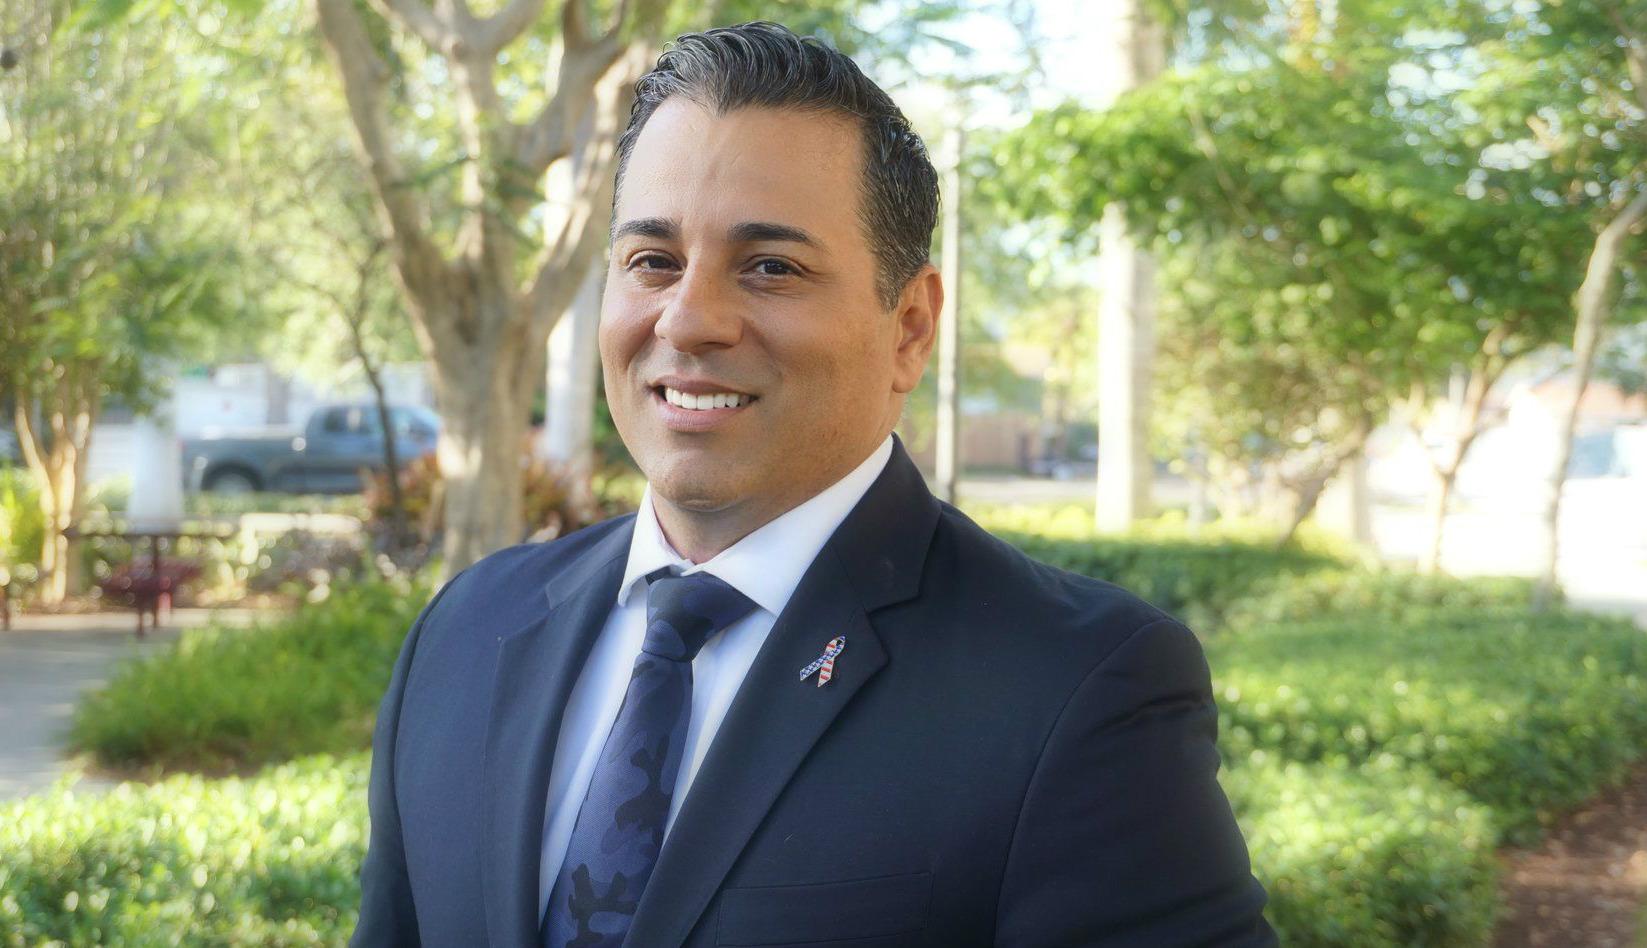 Pam Bondi backs Javier Manjarres for U.S. Congress